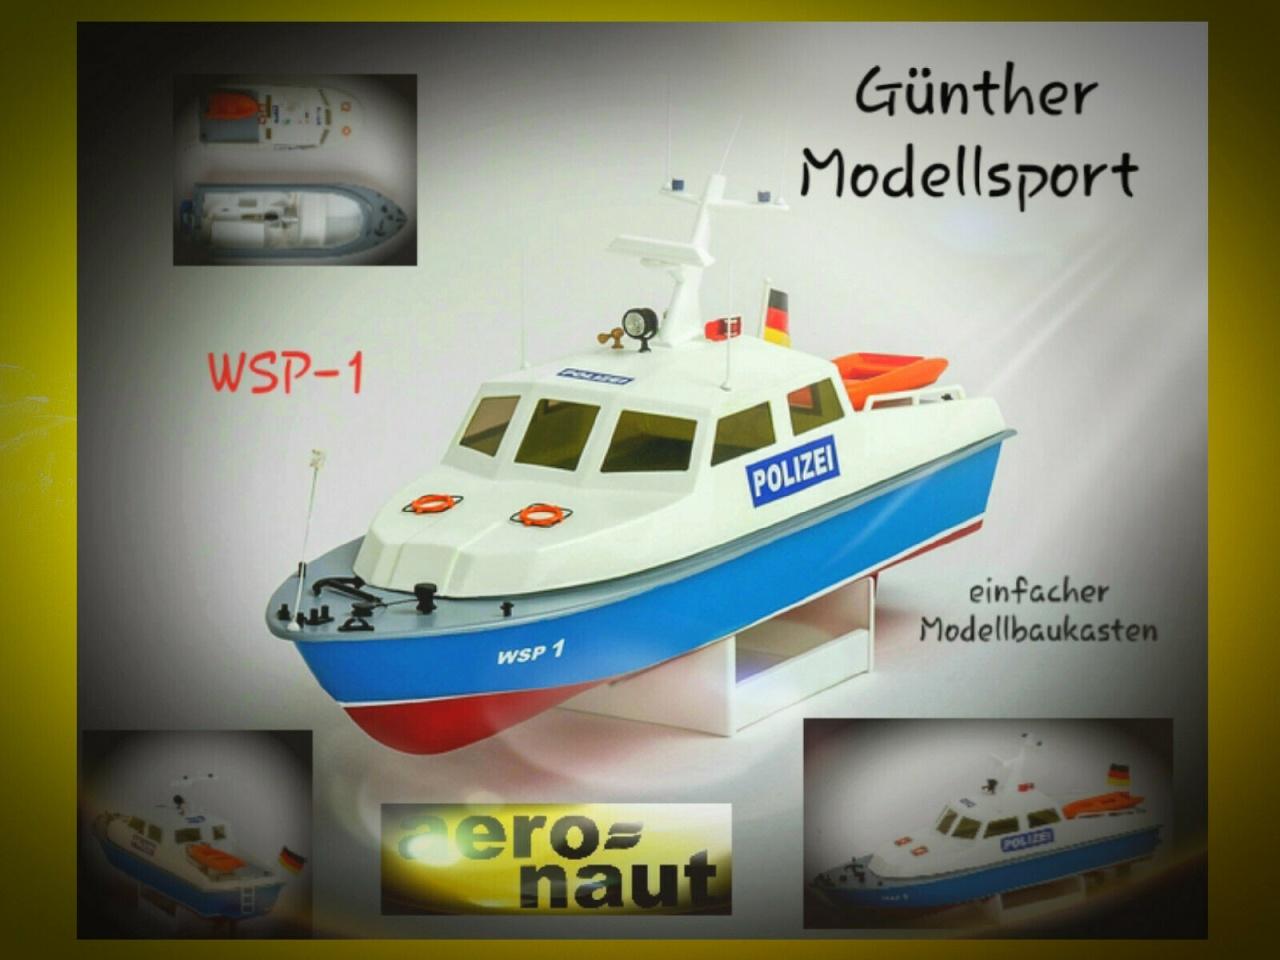 aeronaut Polizeiboot WSP-1, 3058/00